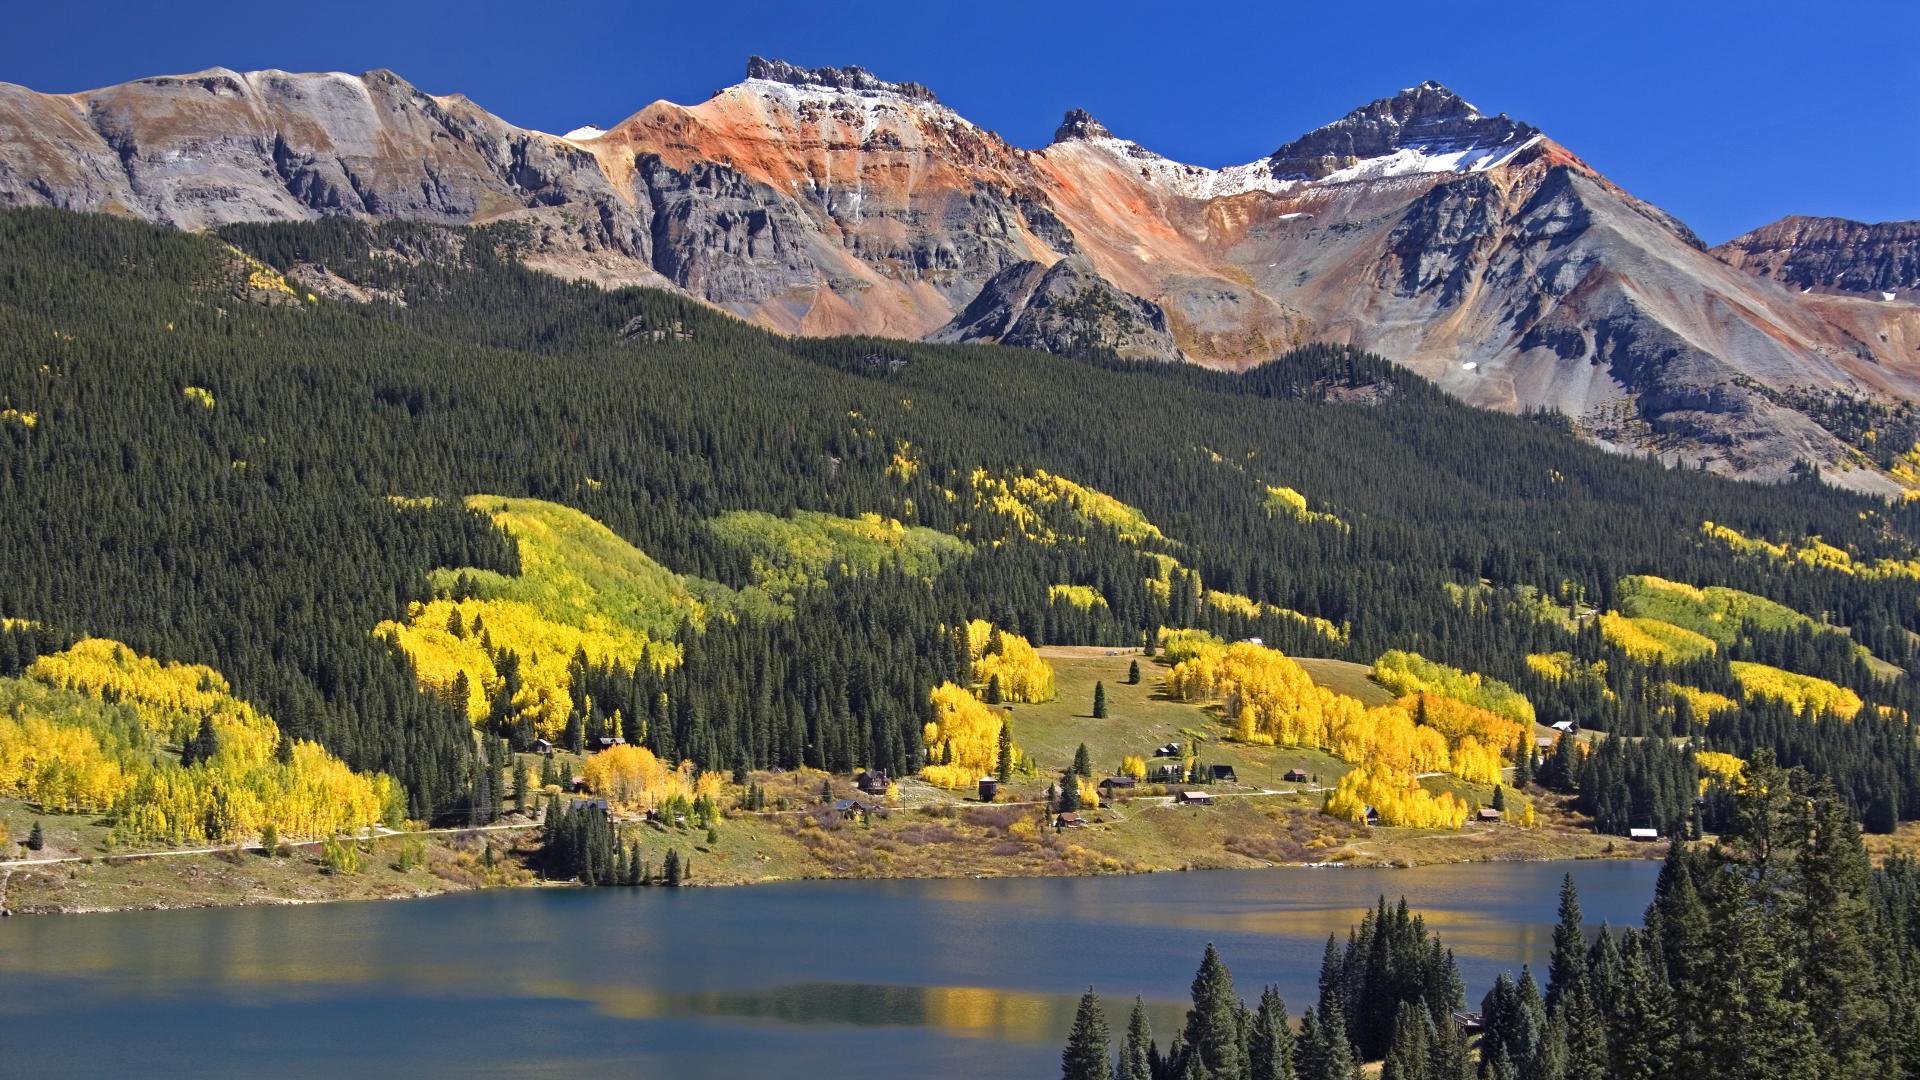 Fall Mountain Desktop, wallpaper, Fall Mountain Desktop hd wallpaper .